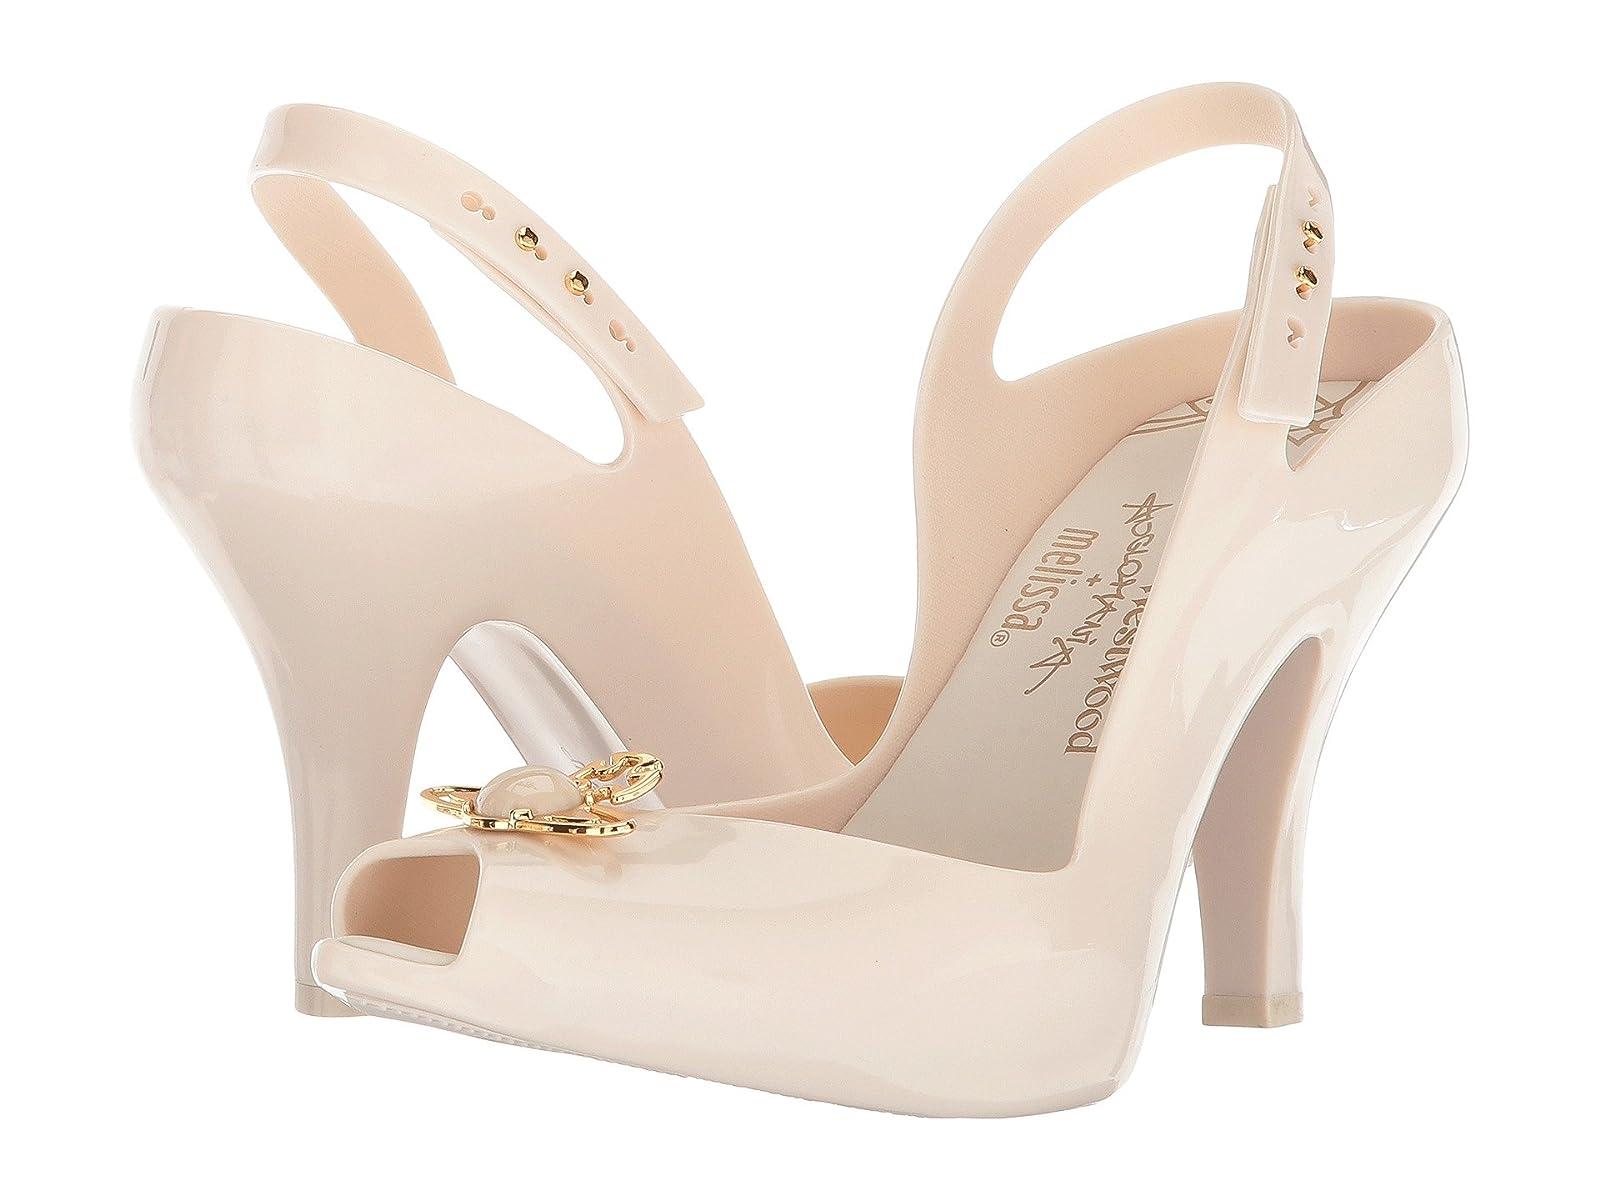 Melissa Shoes VWA + Lady Dragon XIVCheap and distinctive eye-catching shoes